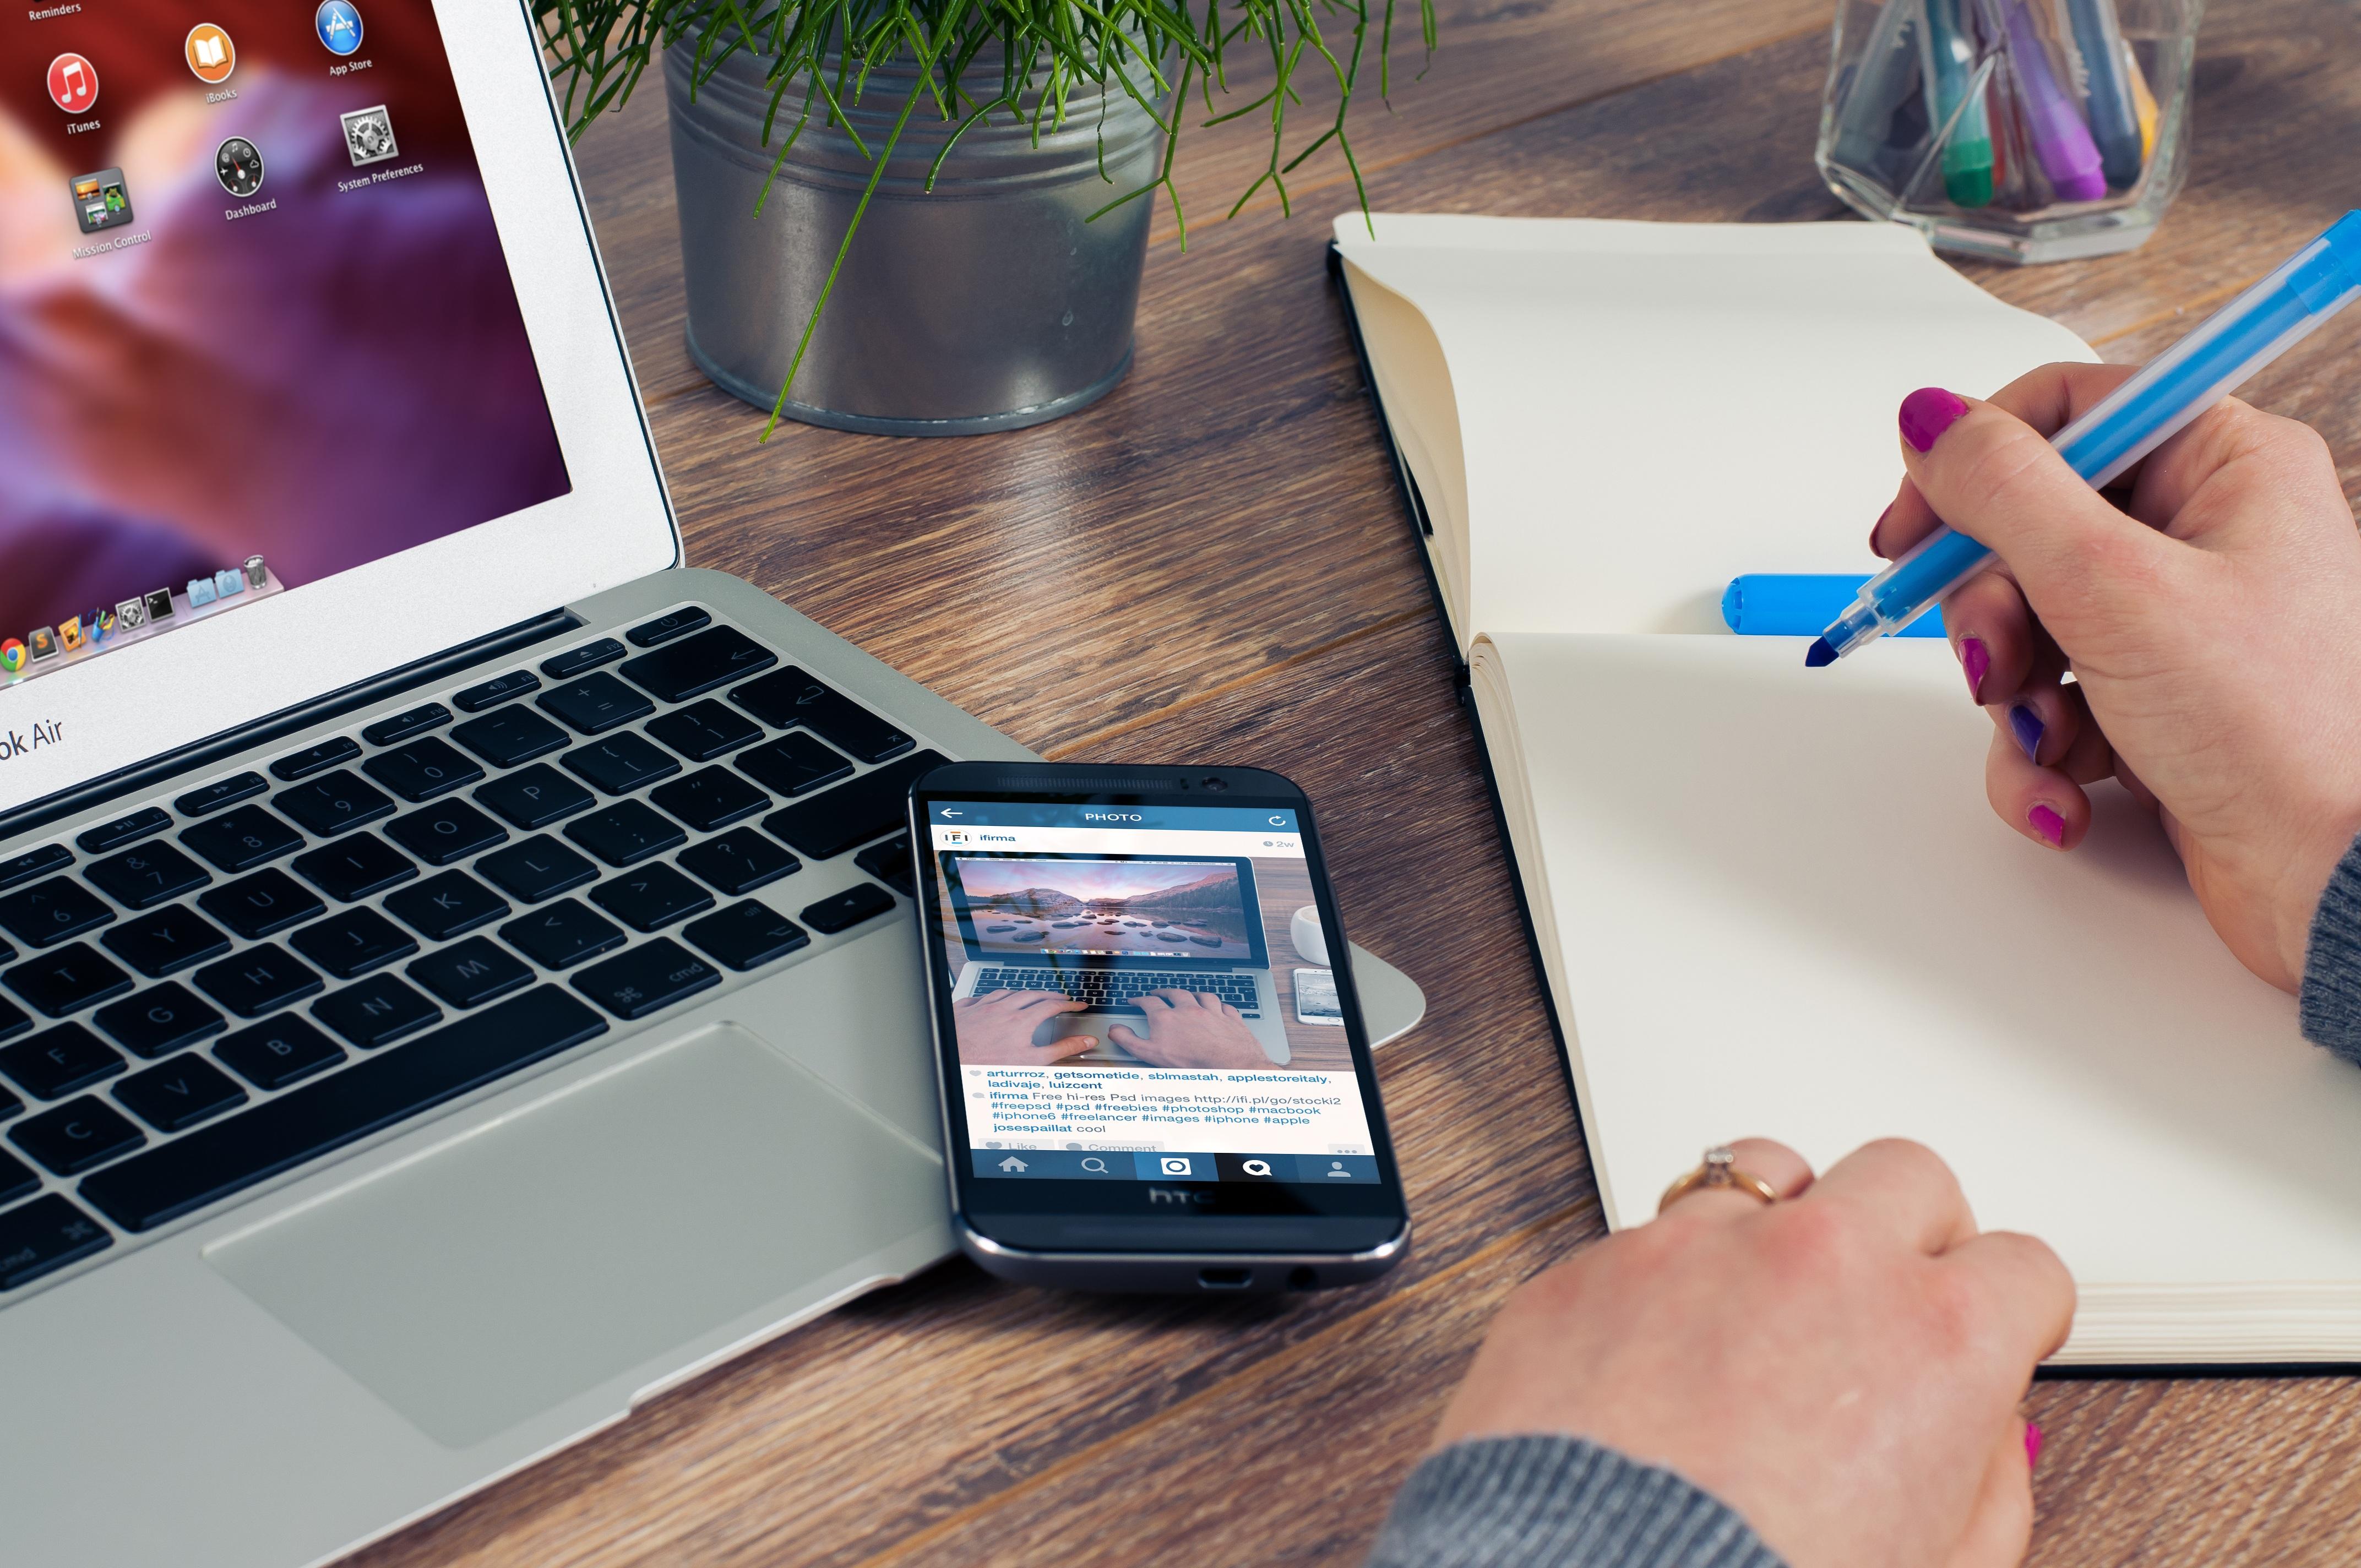 handle online returns process like a pro